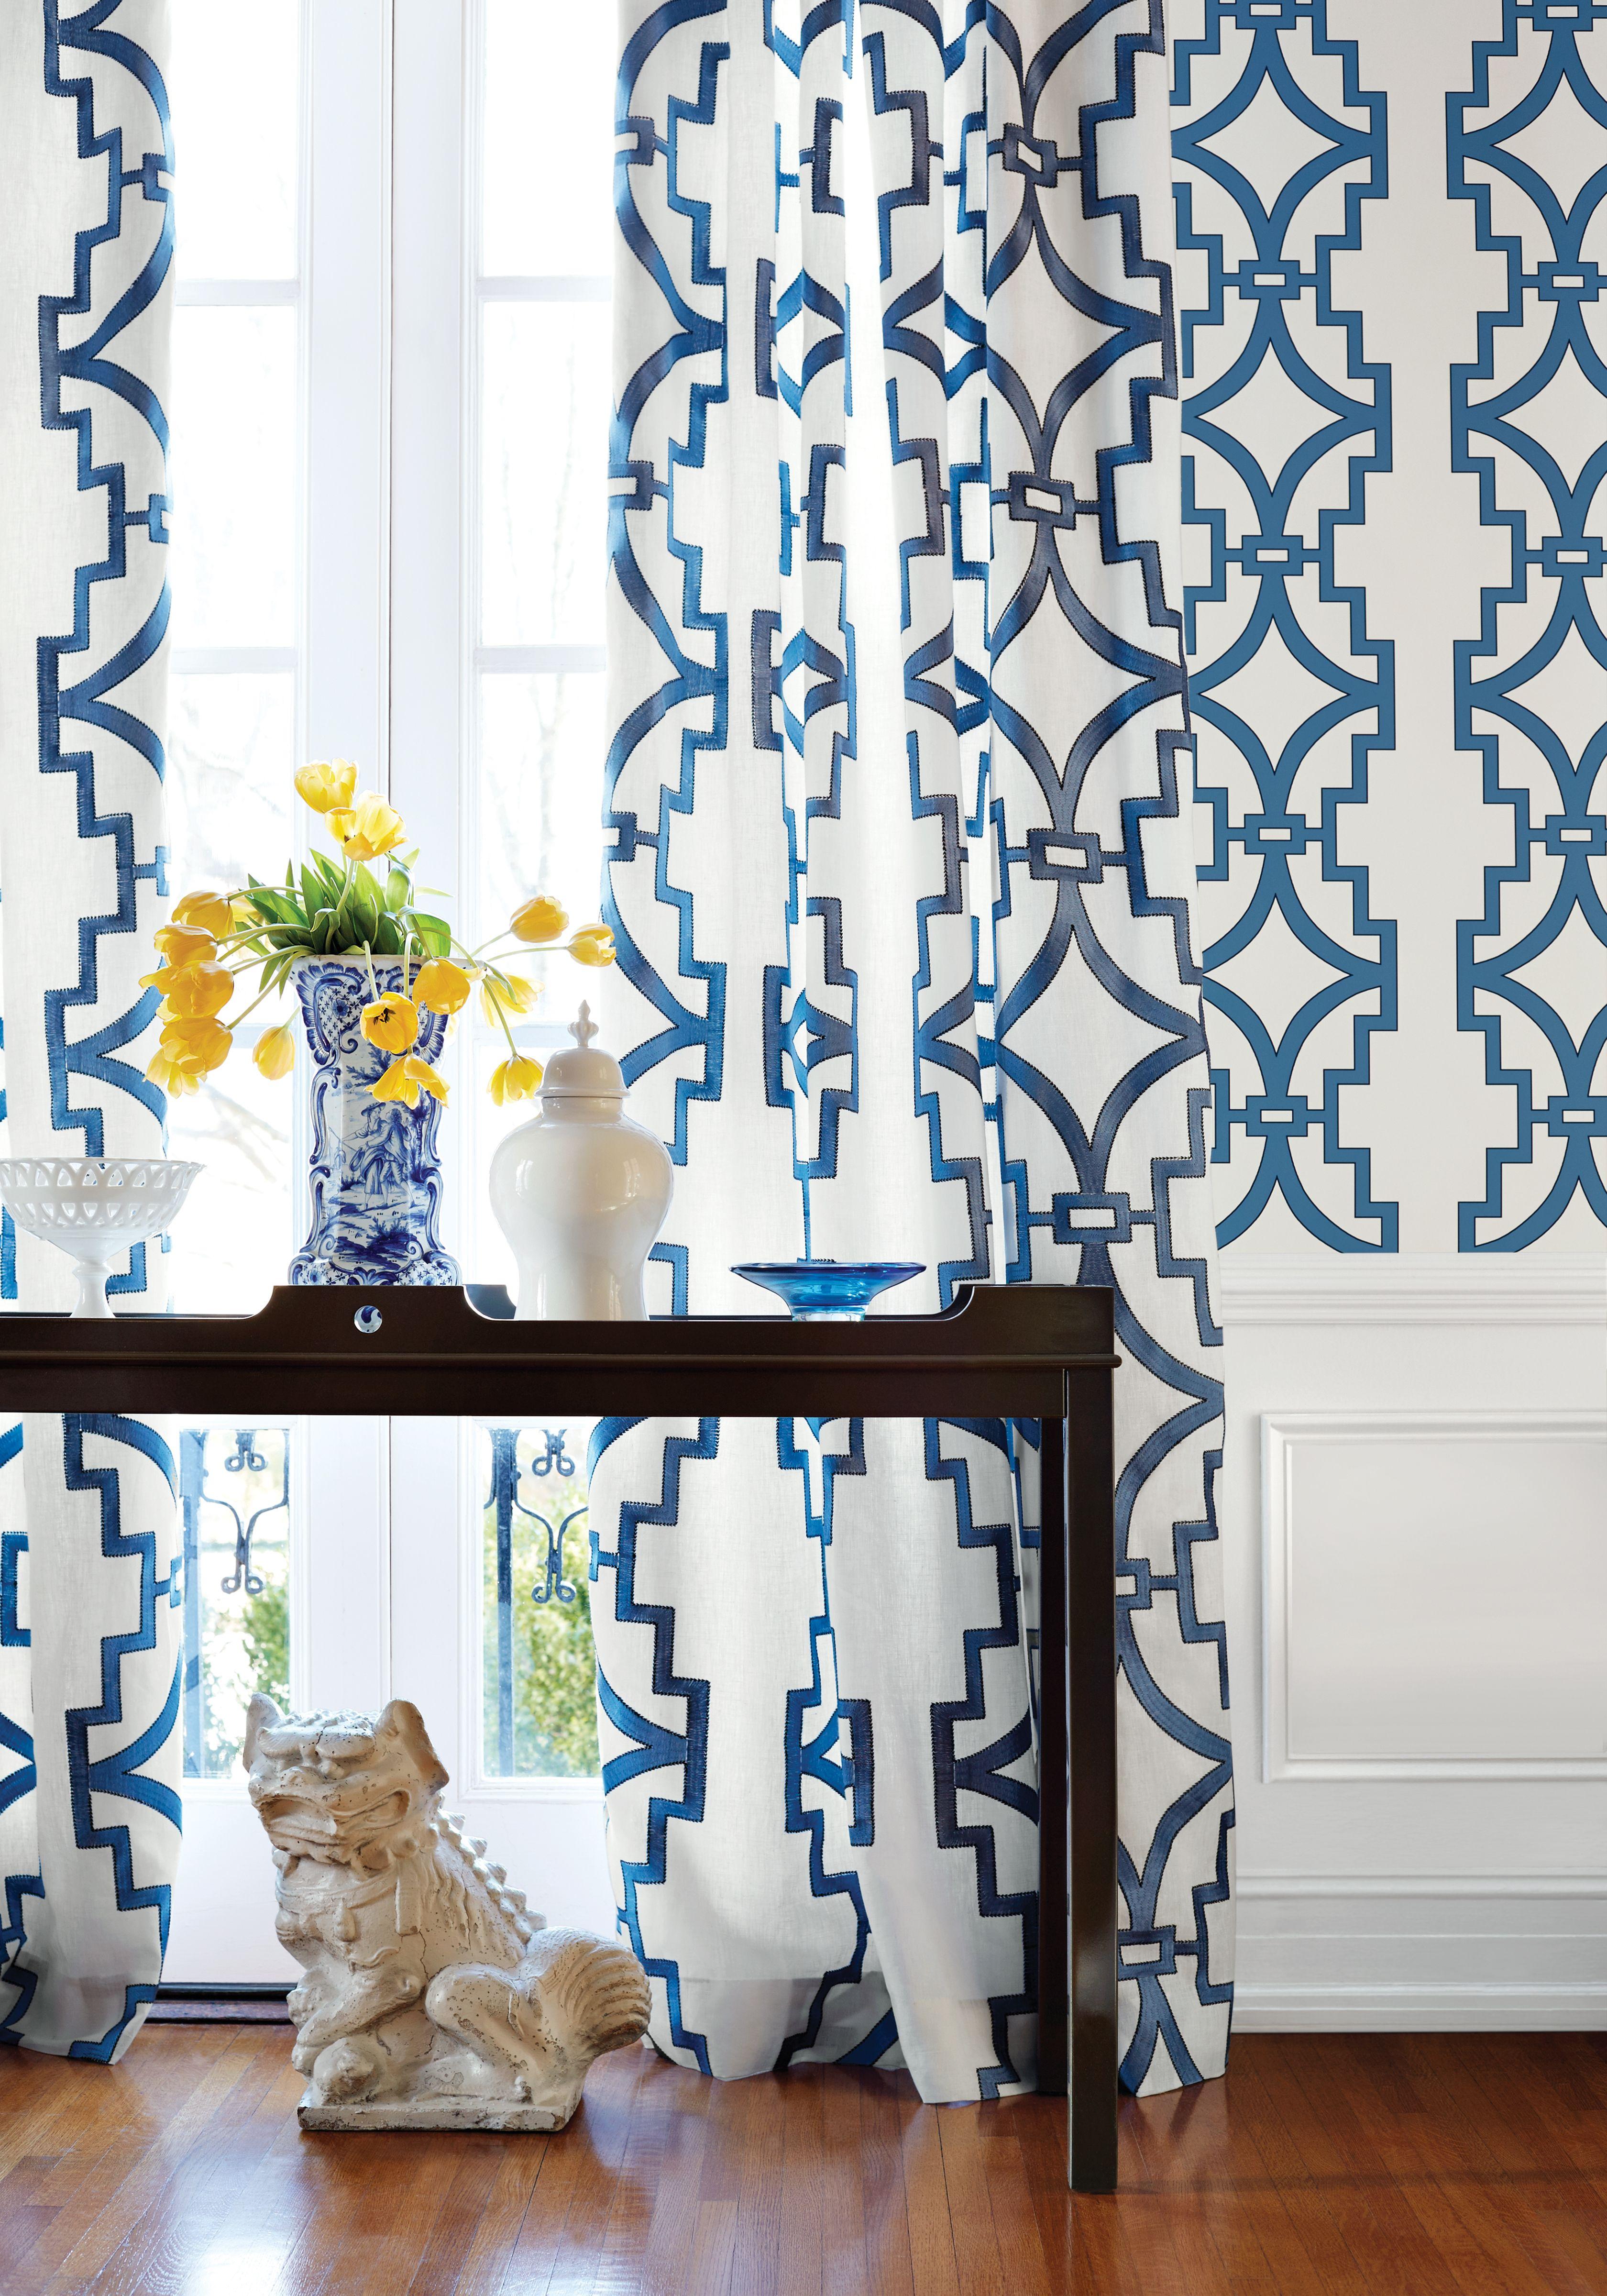 Thibaut enchantment love the pattern. Thibaut